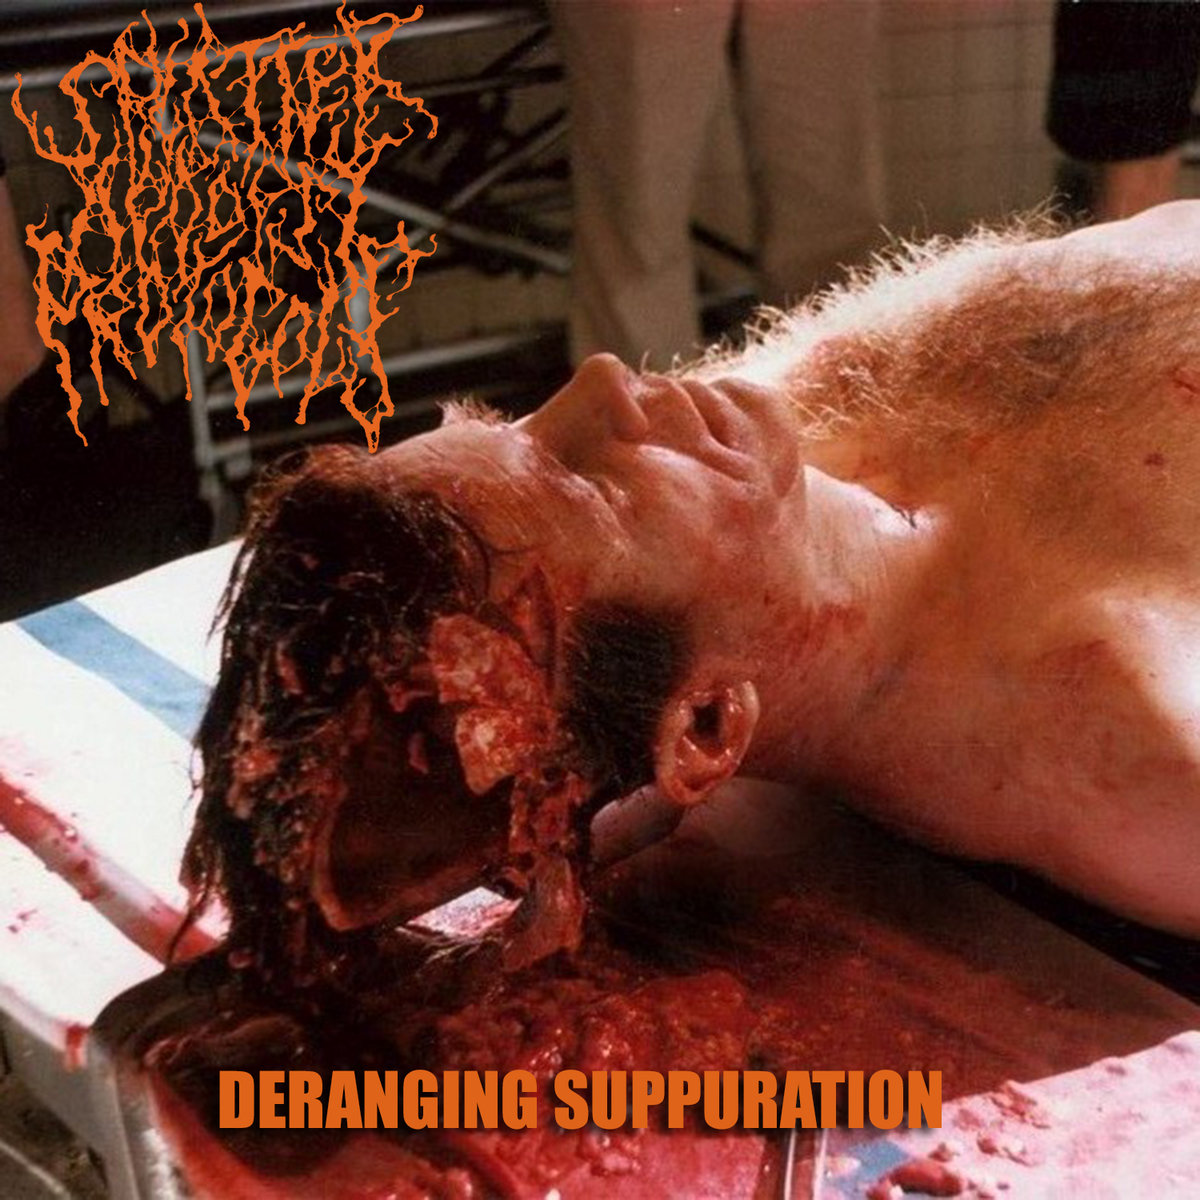 deranging suppuration splatter autopsy protocols